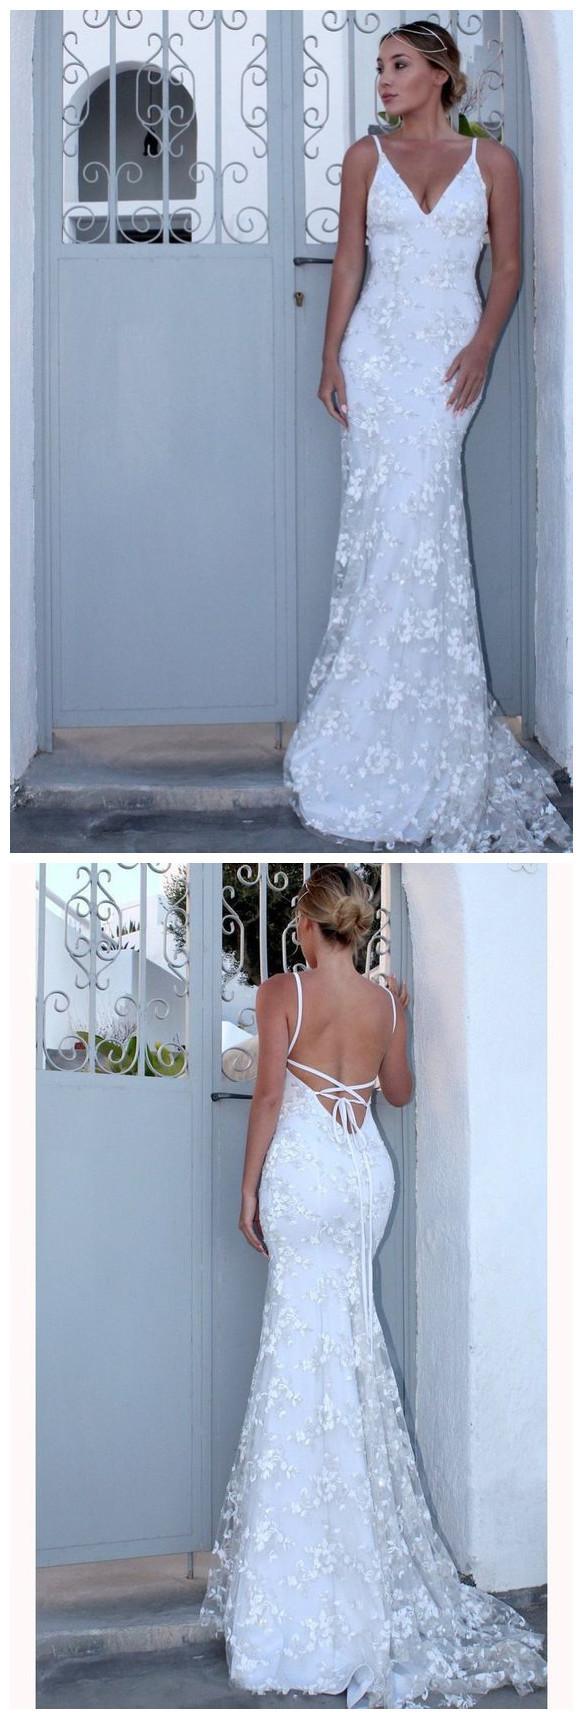 White Spaghetti Strap V Neck Mermaid Prom Dress, Sexy Backless Lace Prom Dress